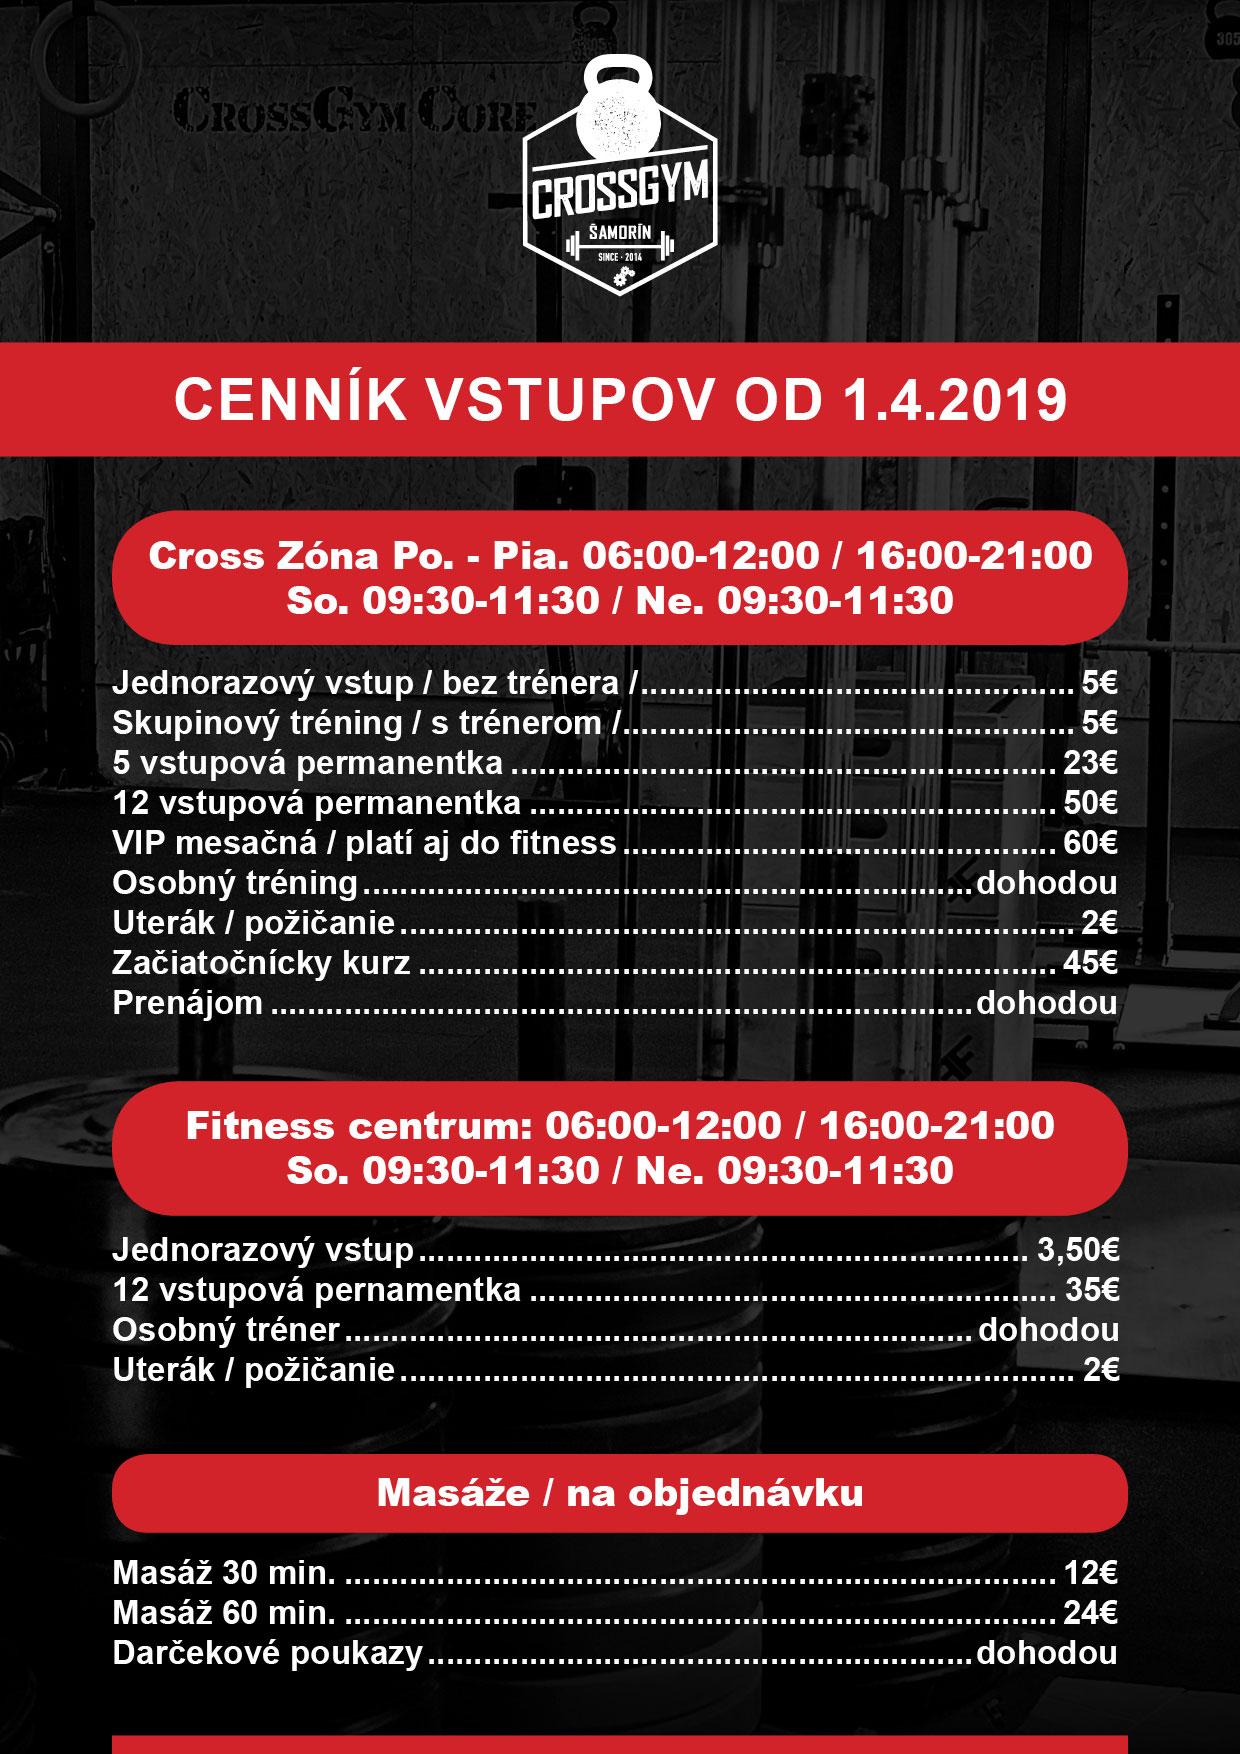 cennik-vstupov_2019.3.21